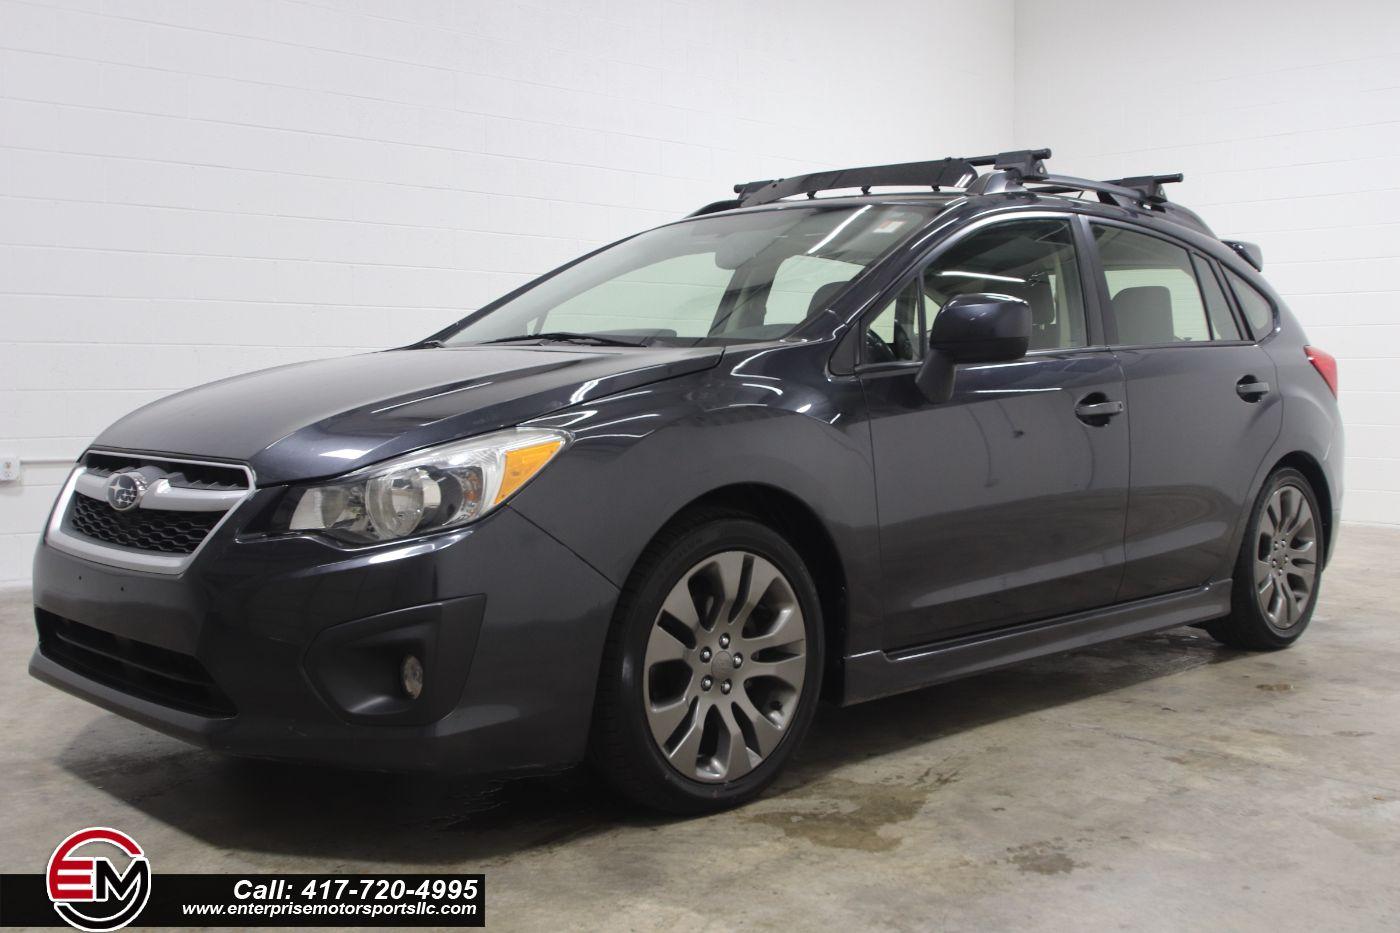 2014 Subaru Impreza Wagon 2.0i Sport Limited